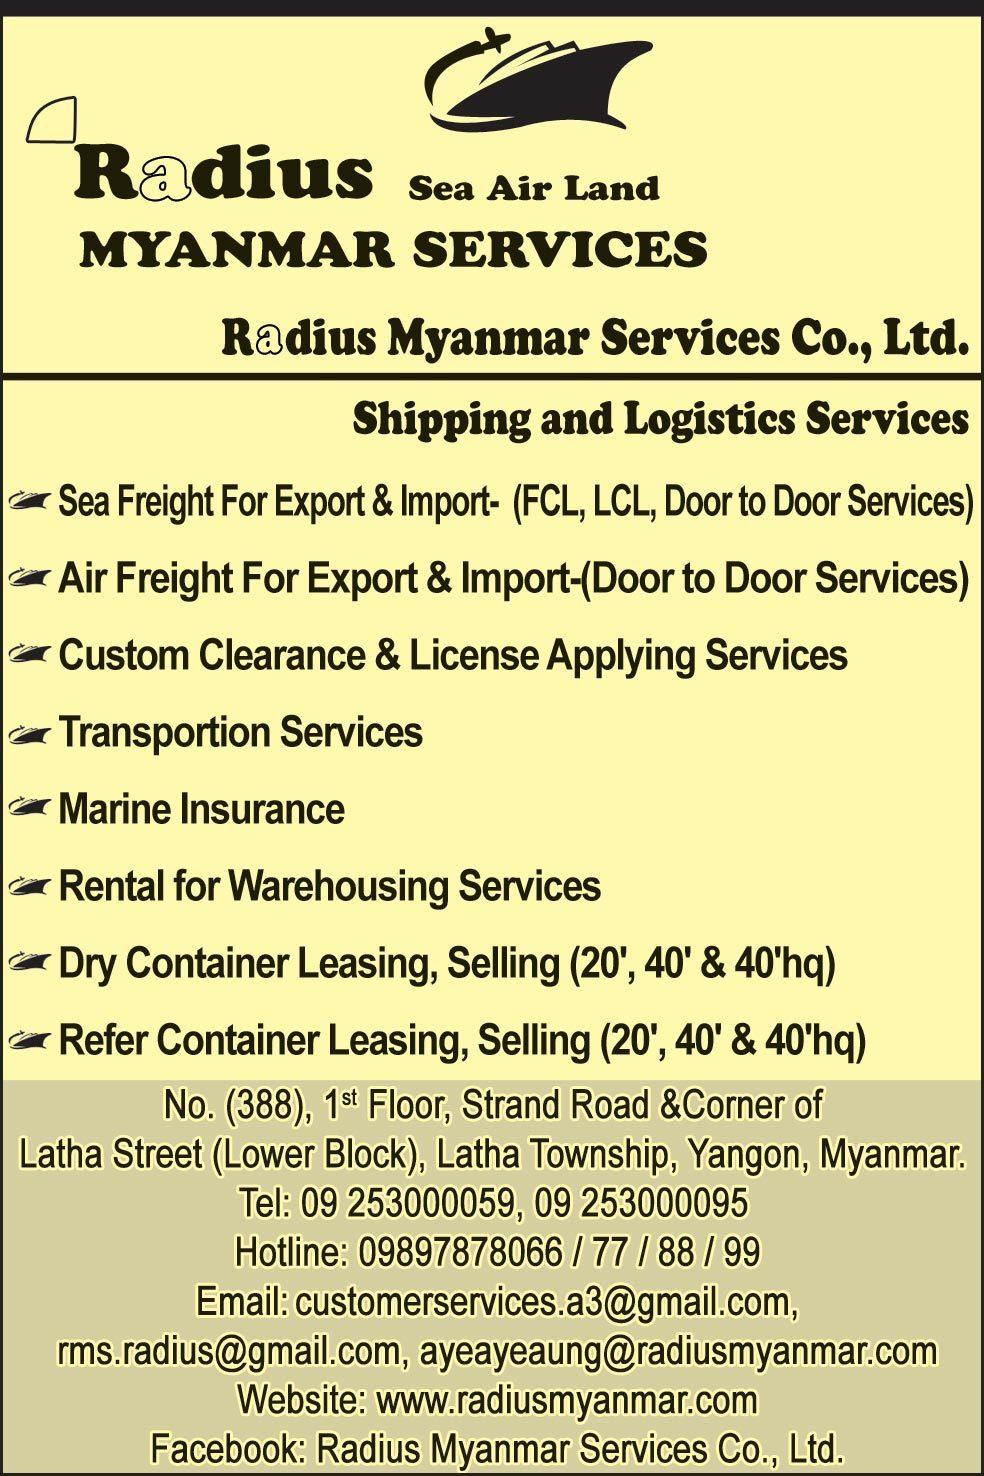 Radius-Myanmar-Service-Co-Ltd_Shipping-Agents_(A)_2681.jpg